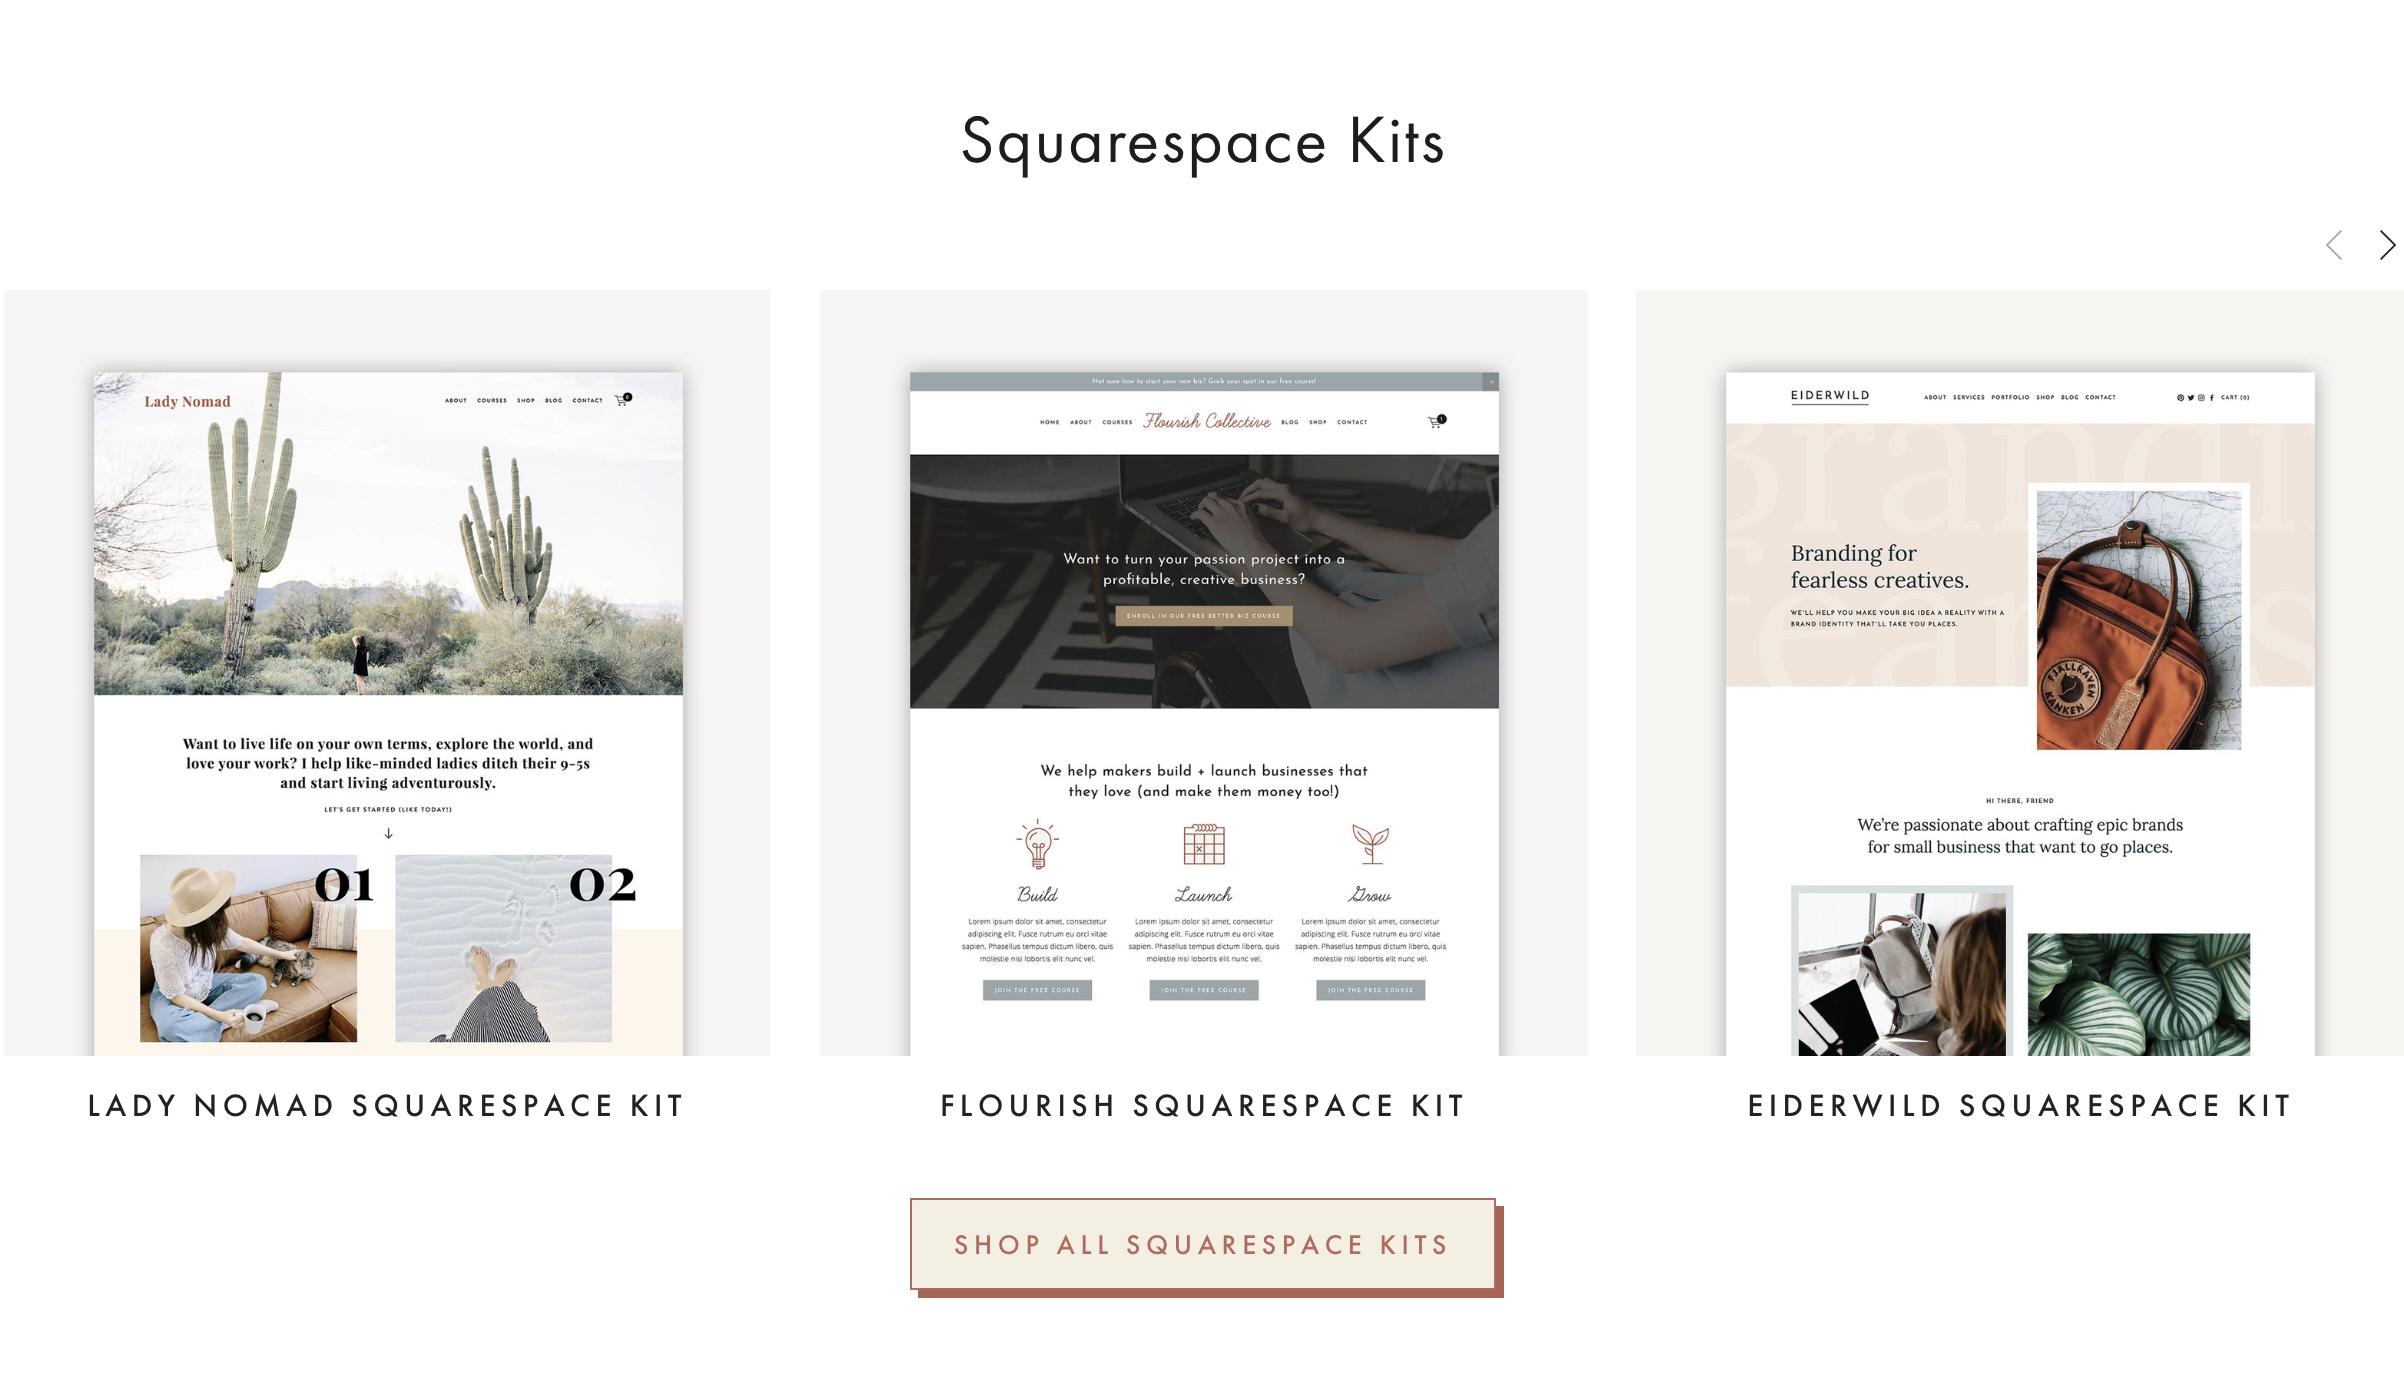 squarespace_kits.png